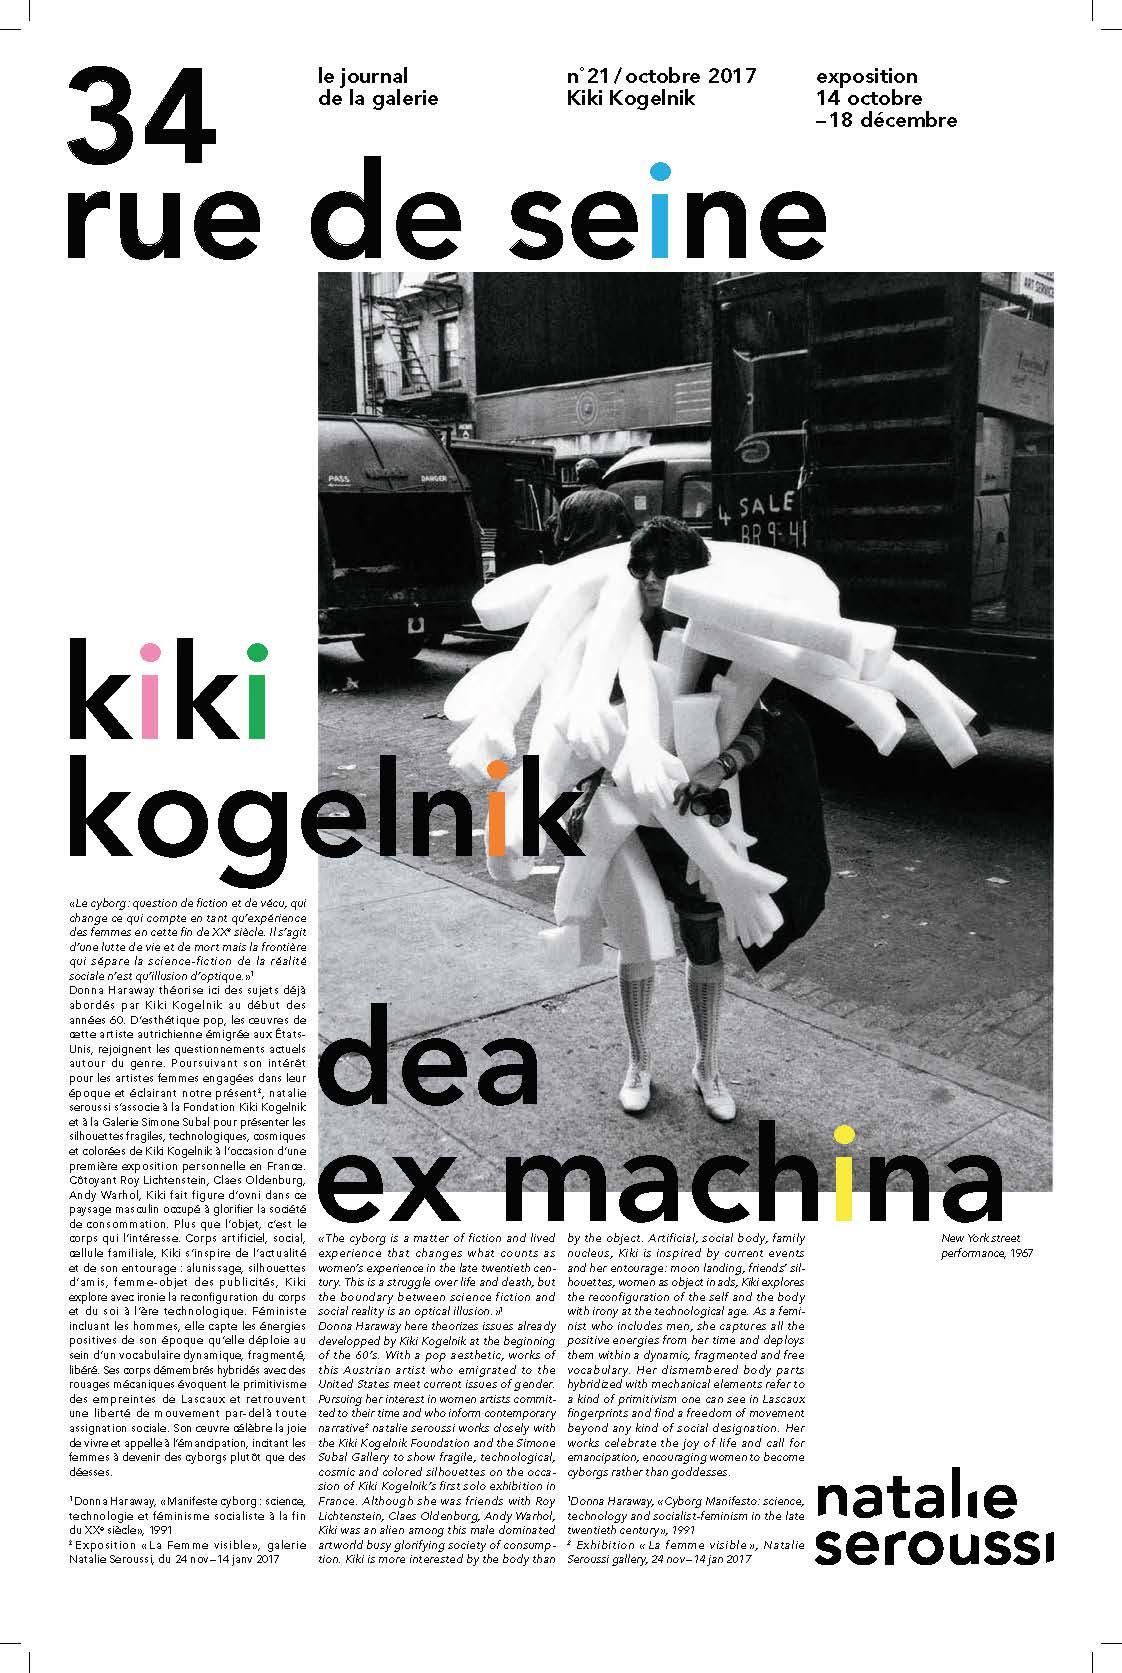 34 rue de Seine n°21 - Kiki Kogelnik dea ex machina